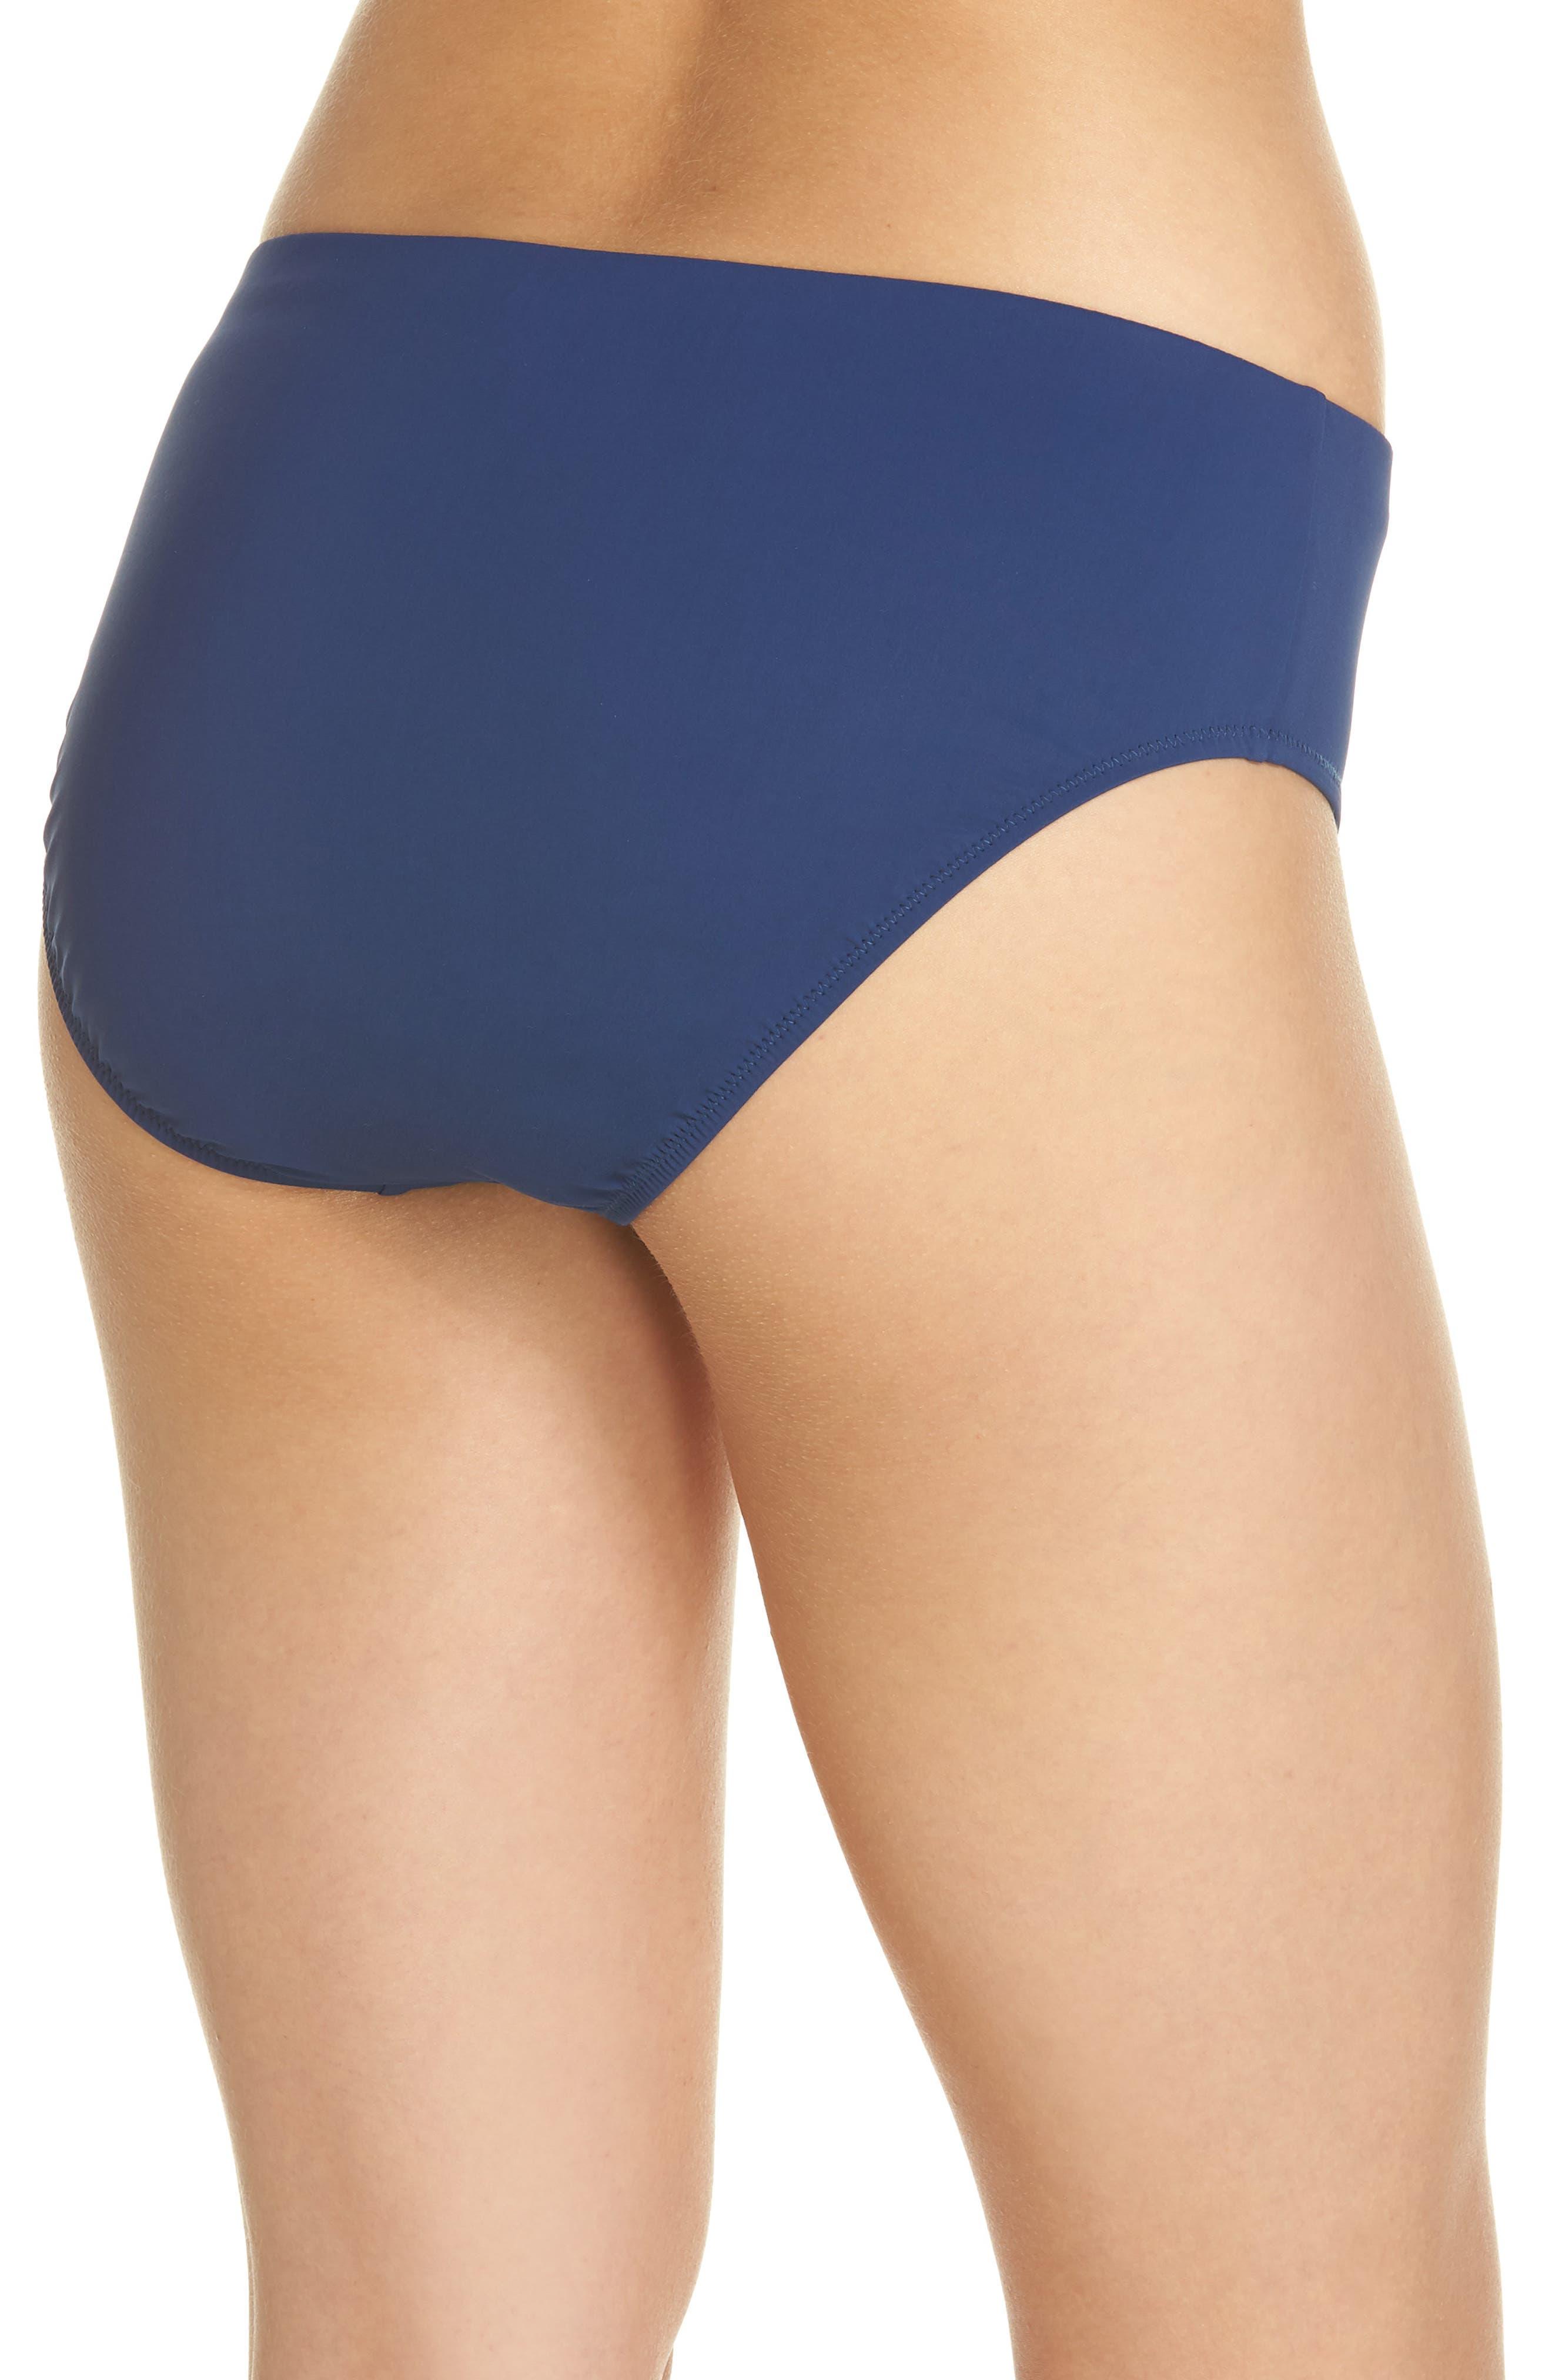 PROFILE BY GOTTEX,                             Hipster Bikini Bottoms,                             Alternate thumbnail 2, color,                             427